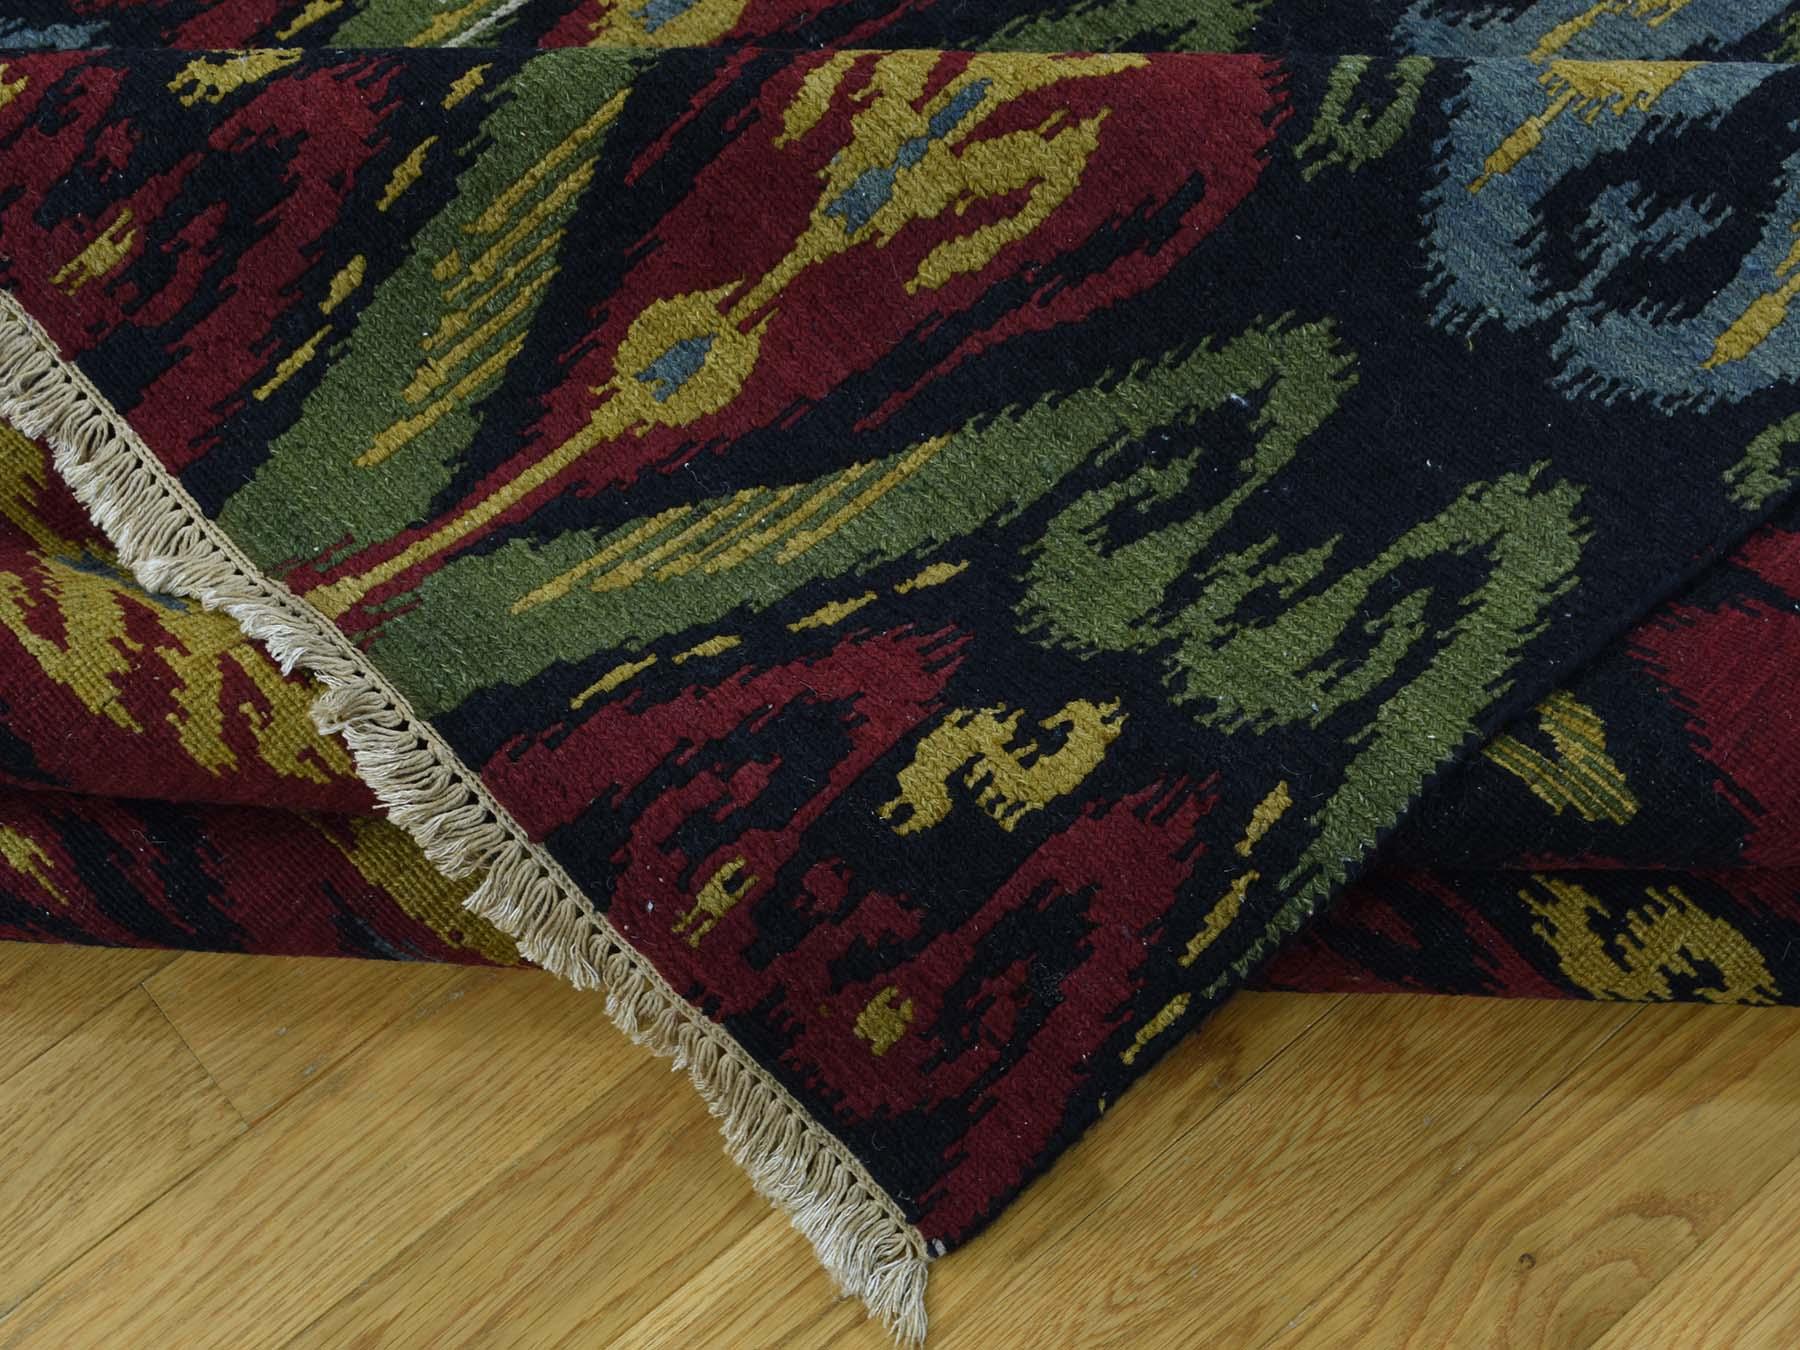 8-10 x11-10  Ikat Design Soumak Double Weft Hand-Woven Oriental Rug